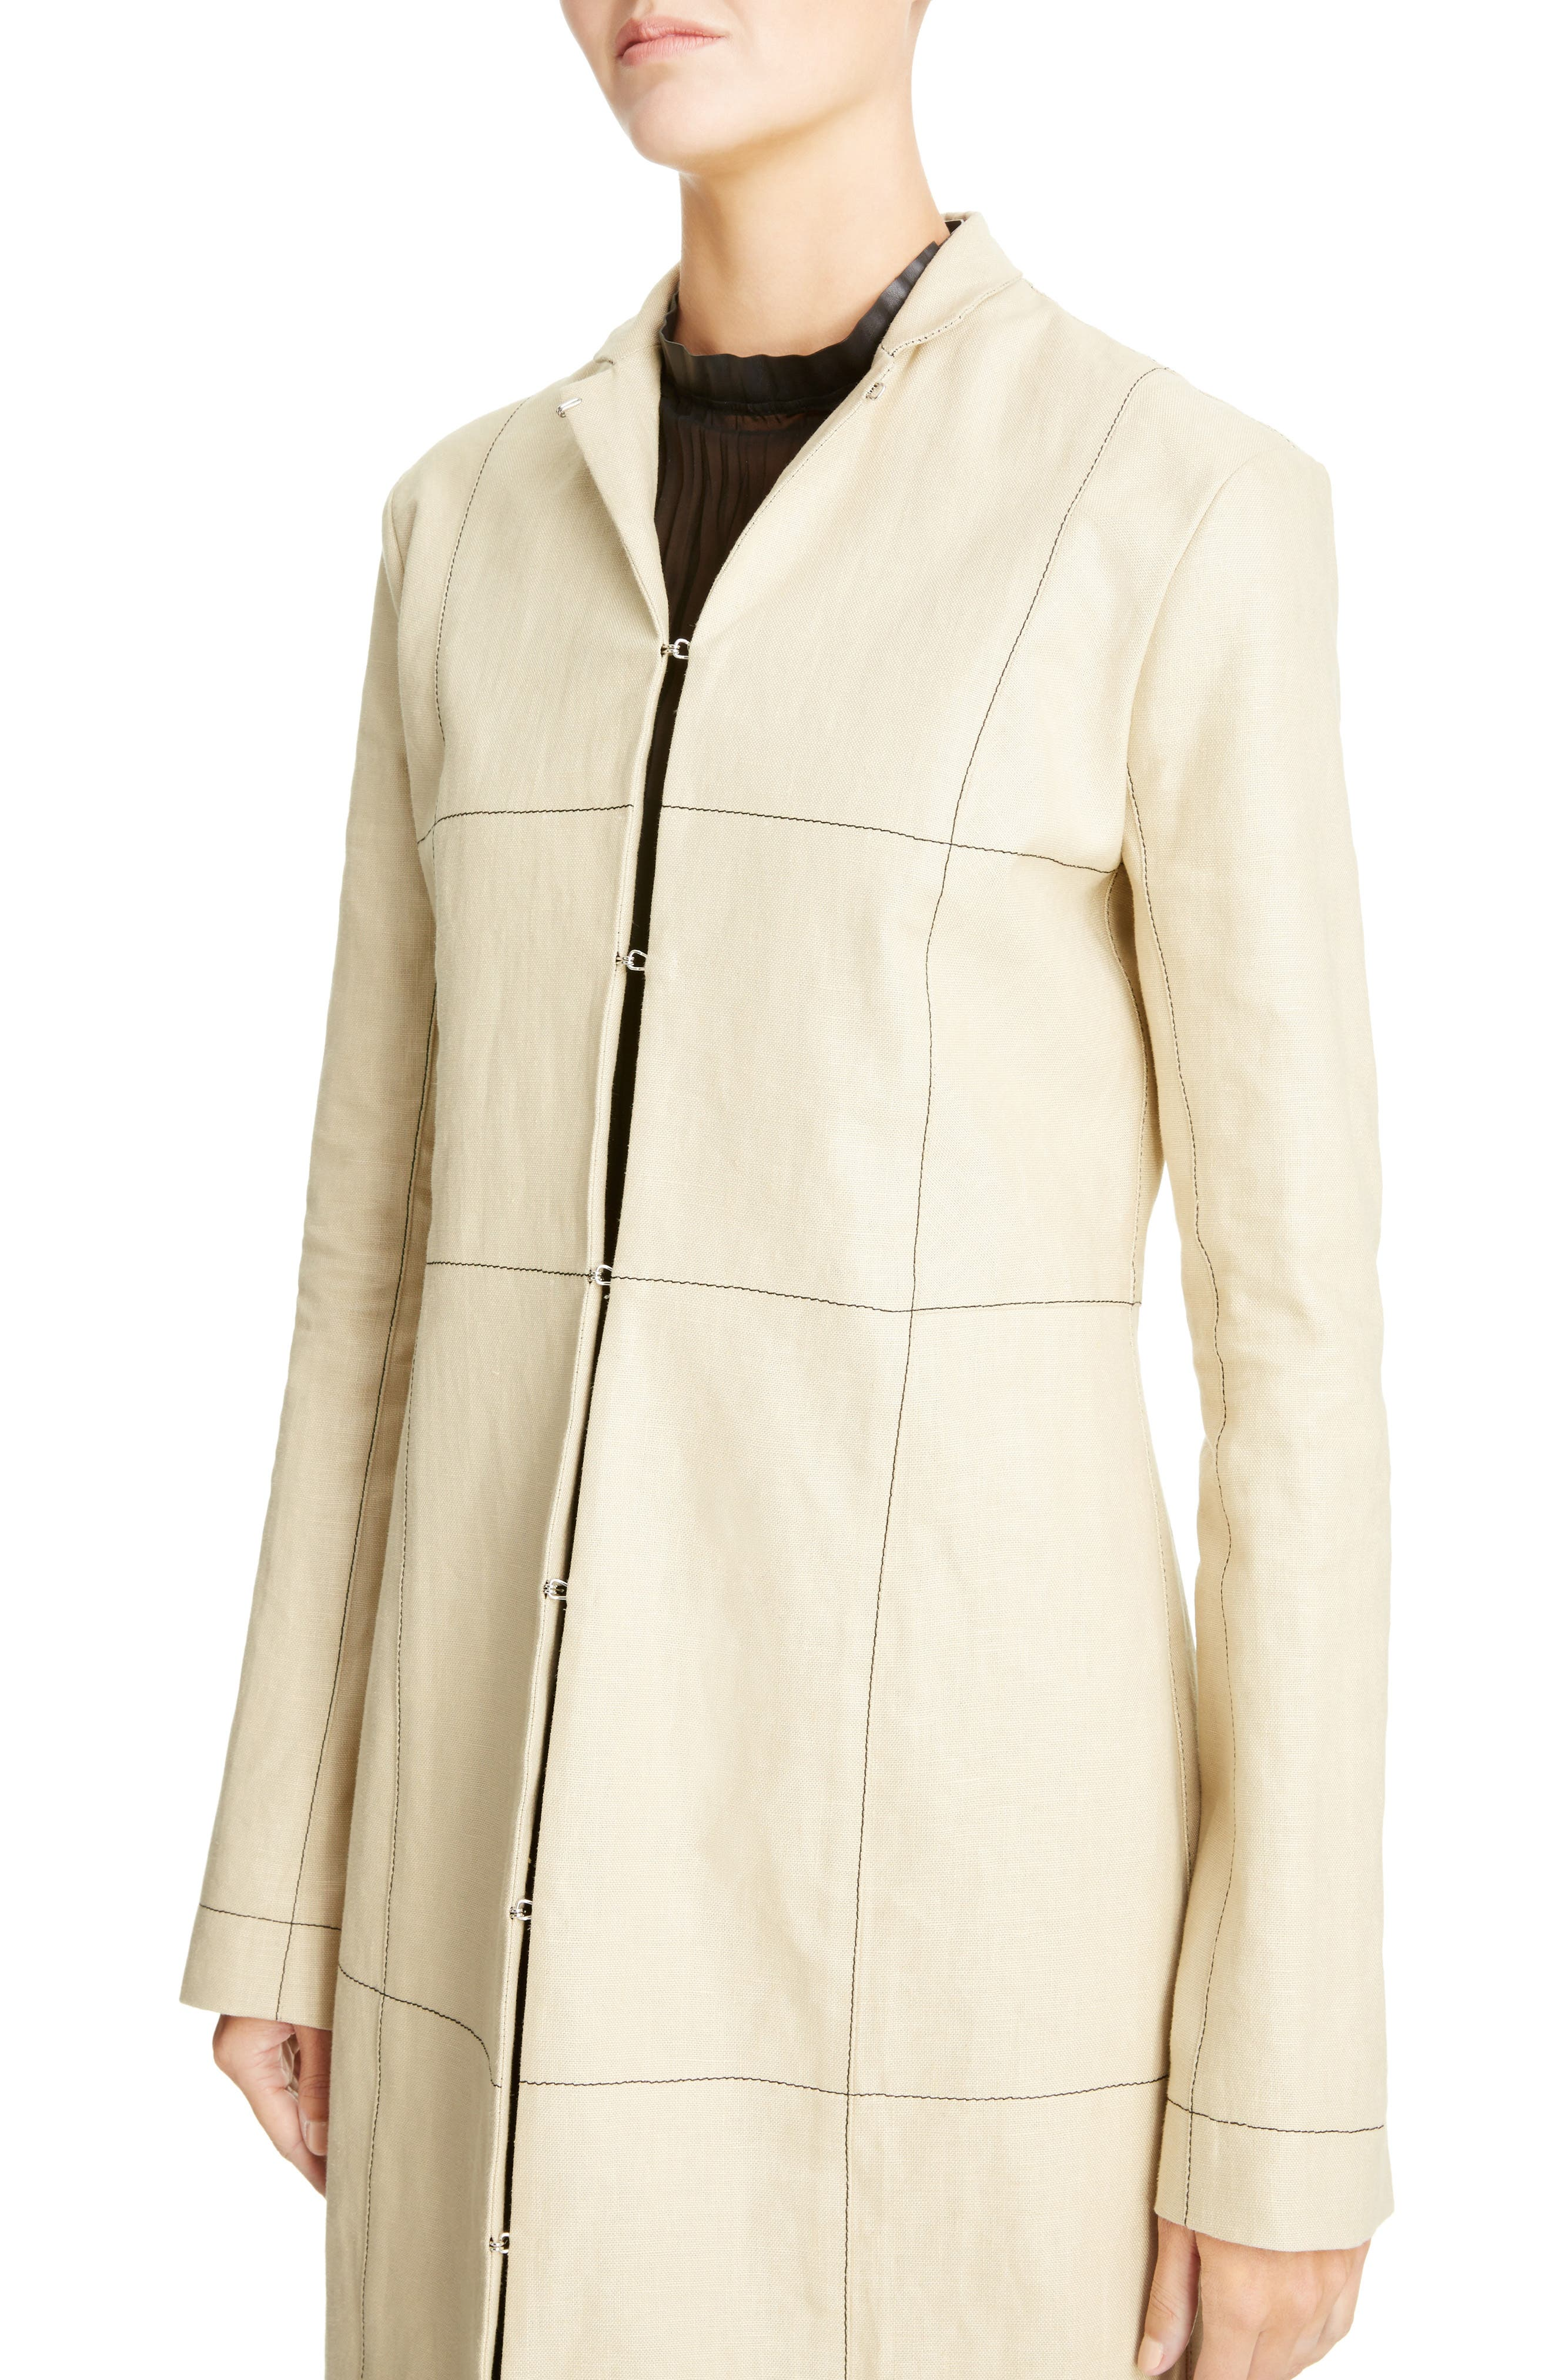 Topstitched Linen Coat,                             Alternate thumbnail 4, color,                             273